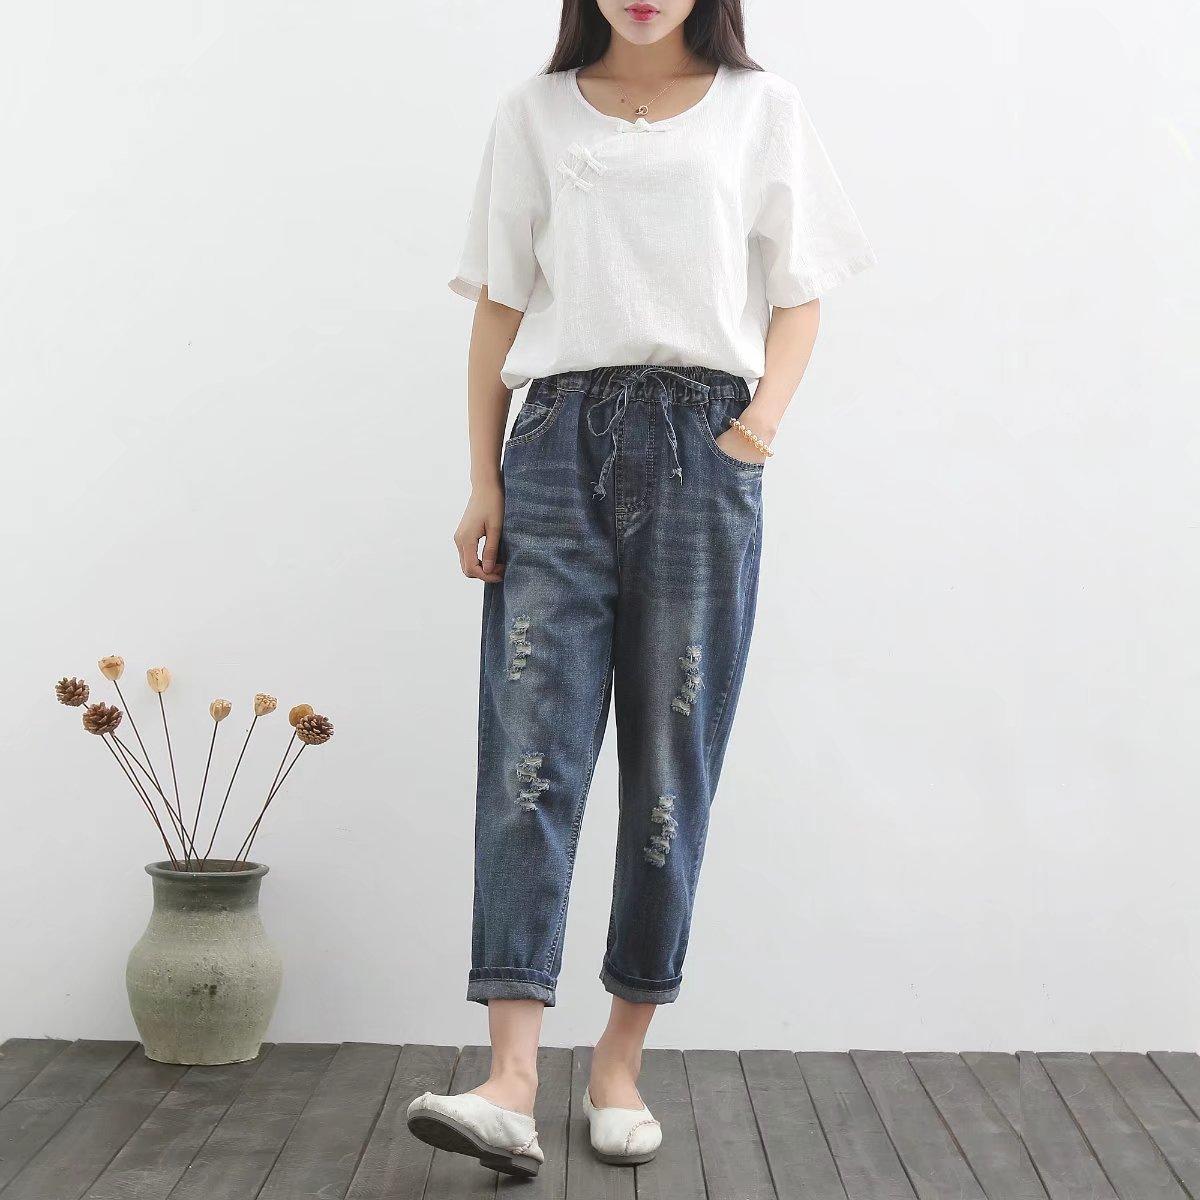 Women Summer Loose Large size Jeans 2017 Female Retro New Slim-type High Quality Denim Trousers Elastic Waist Holes Denim Pants